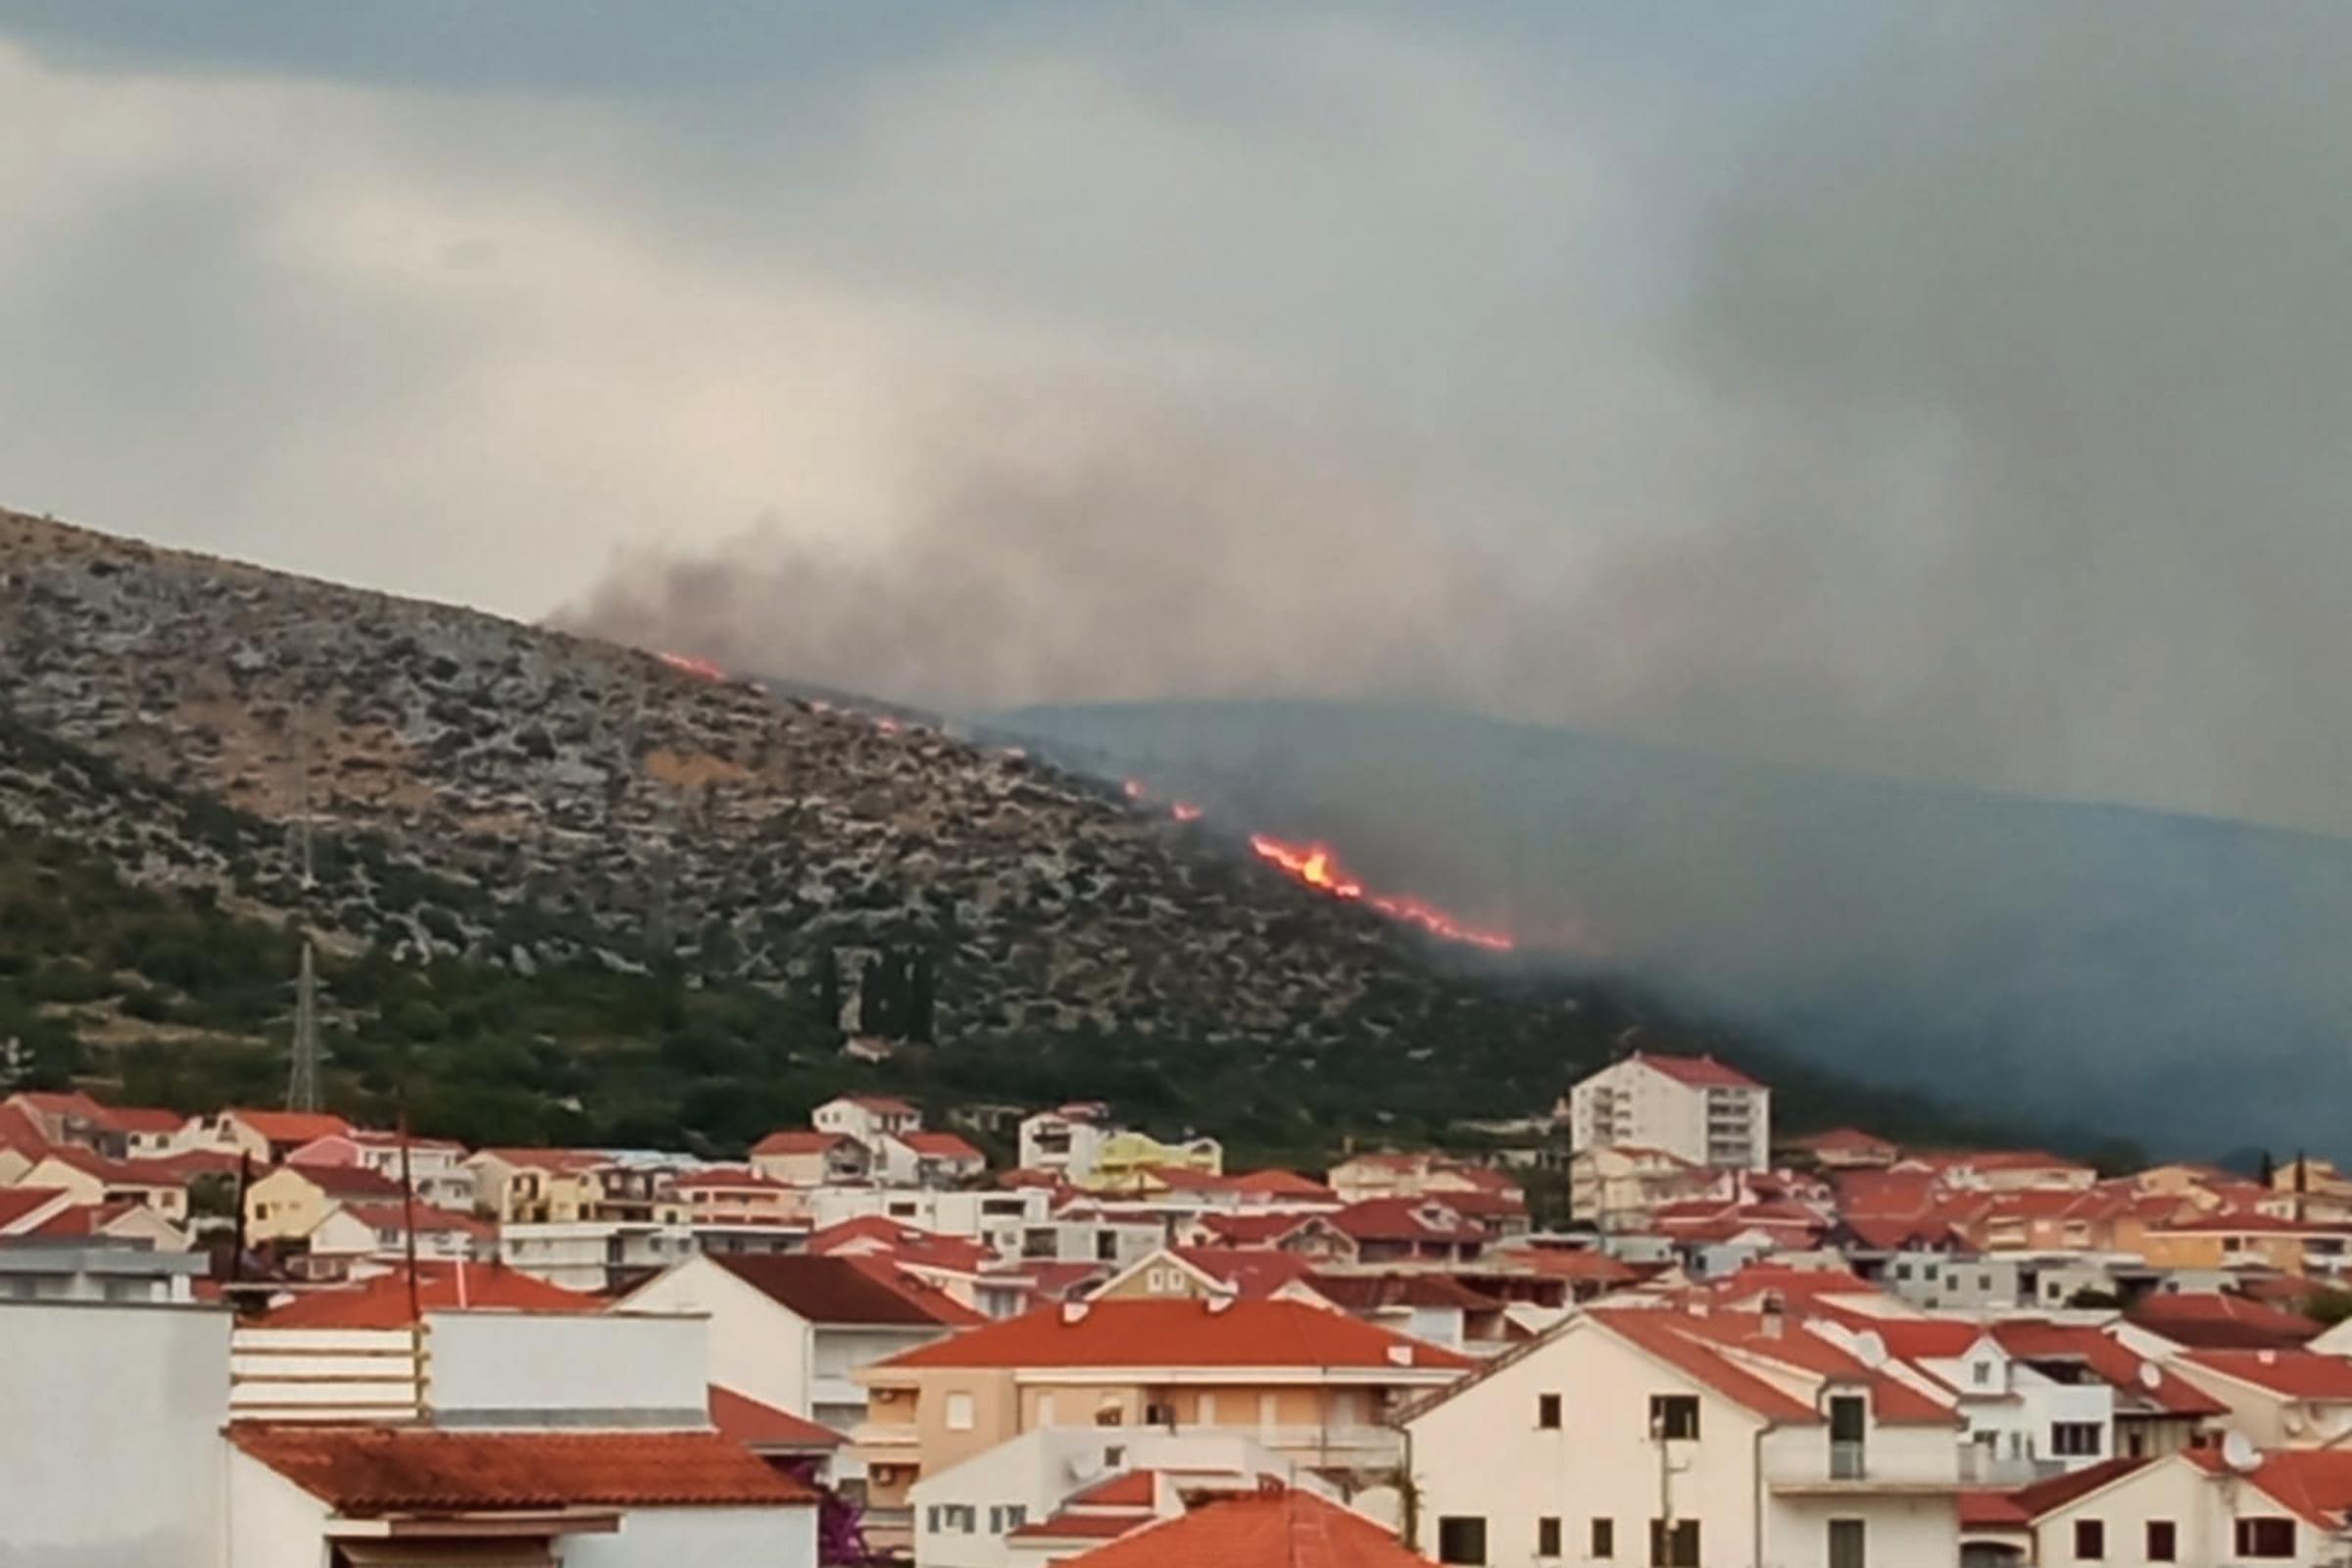 Zračne snage gasile požar kod Trogira